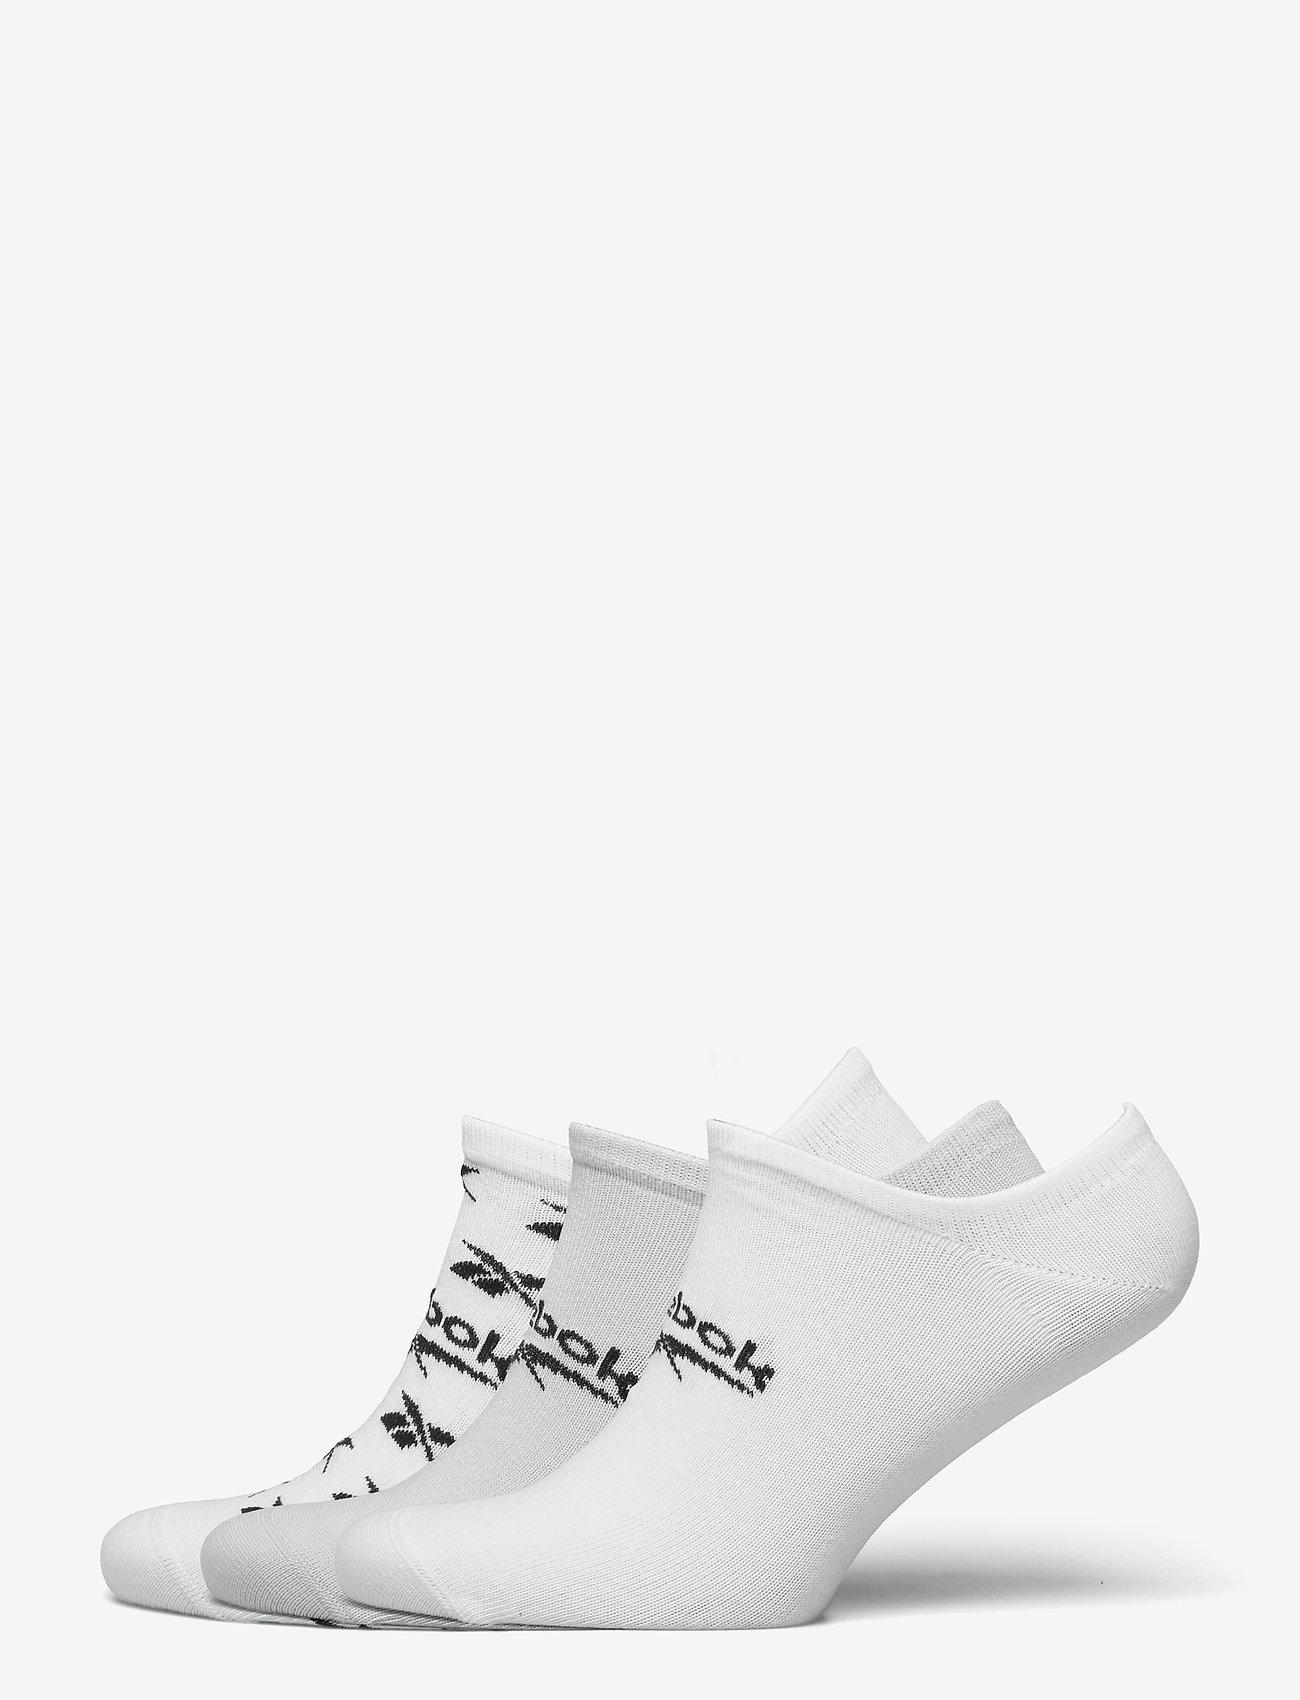 Reebok Classics - CL FO Invisible Sock 3P - kousen - white/lgsogr/white - 0